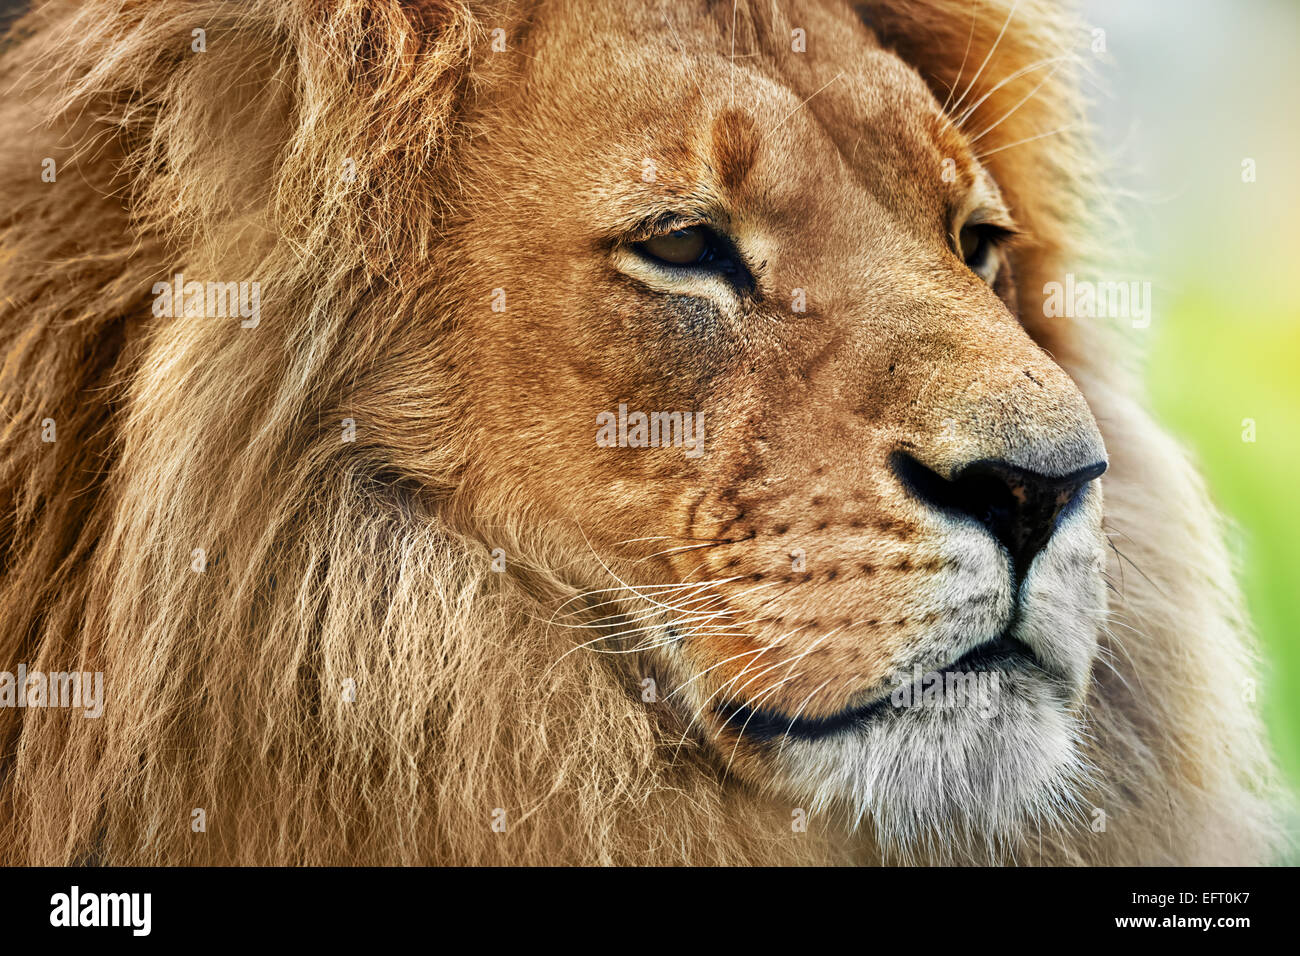 Lion portrait on savanna, safari. Big adult lion with rich mane. - Stock Image